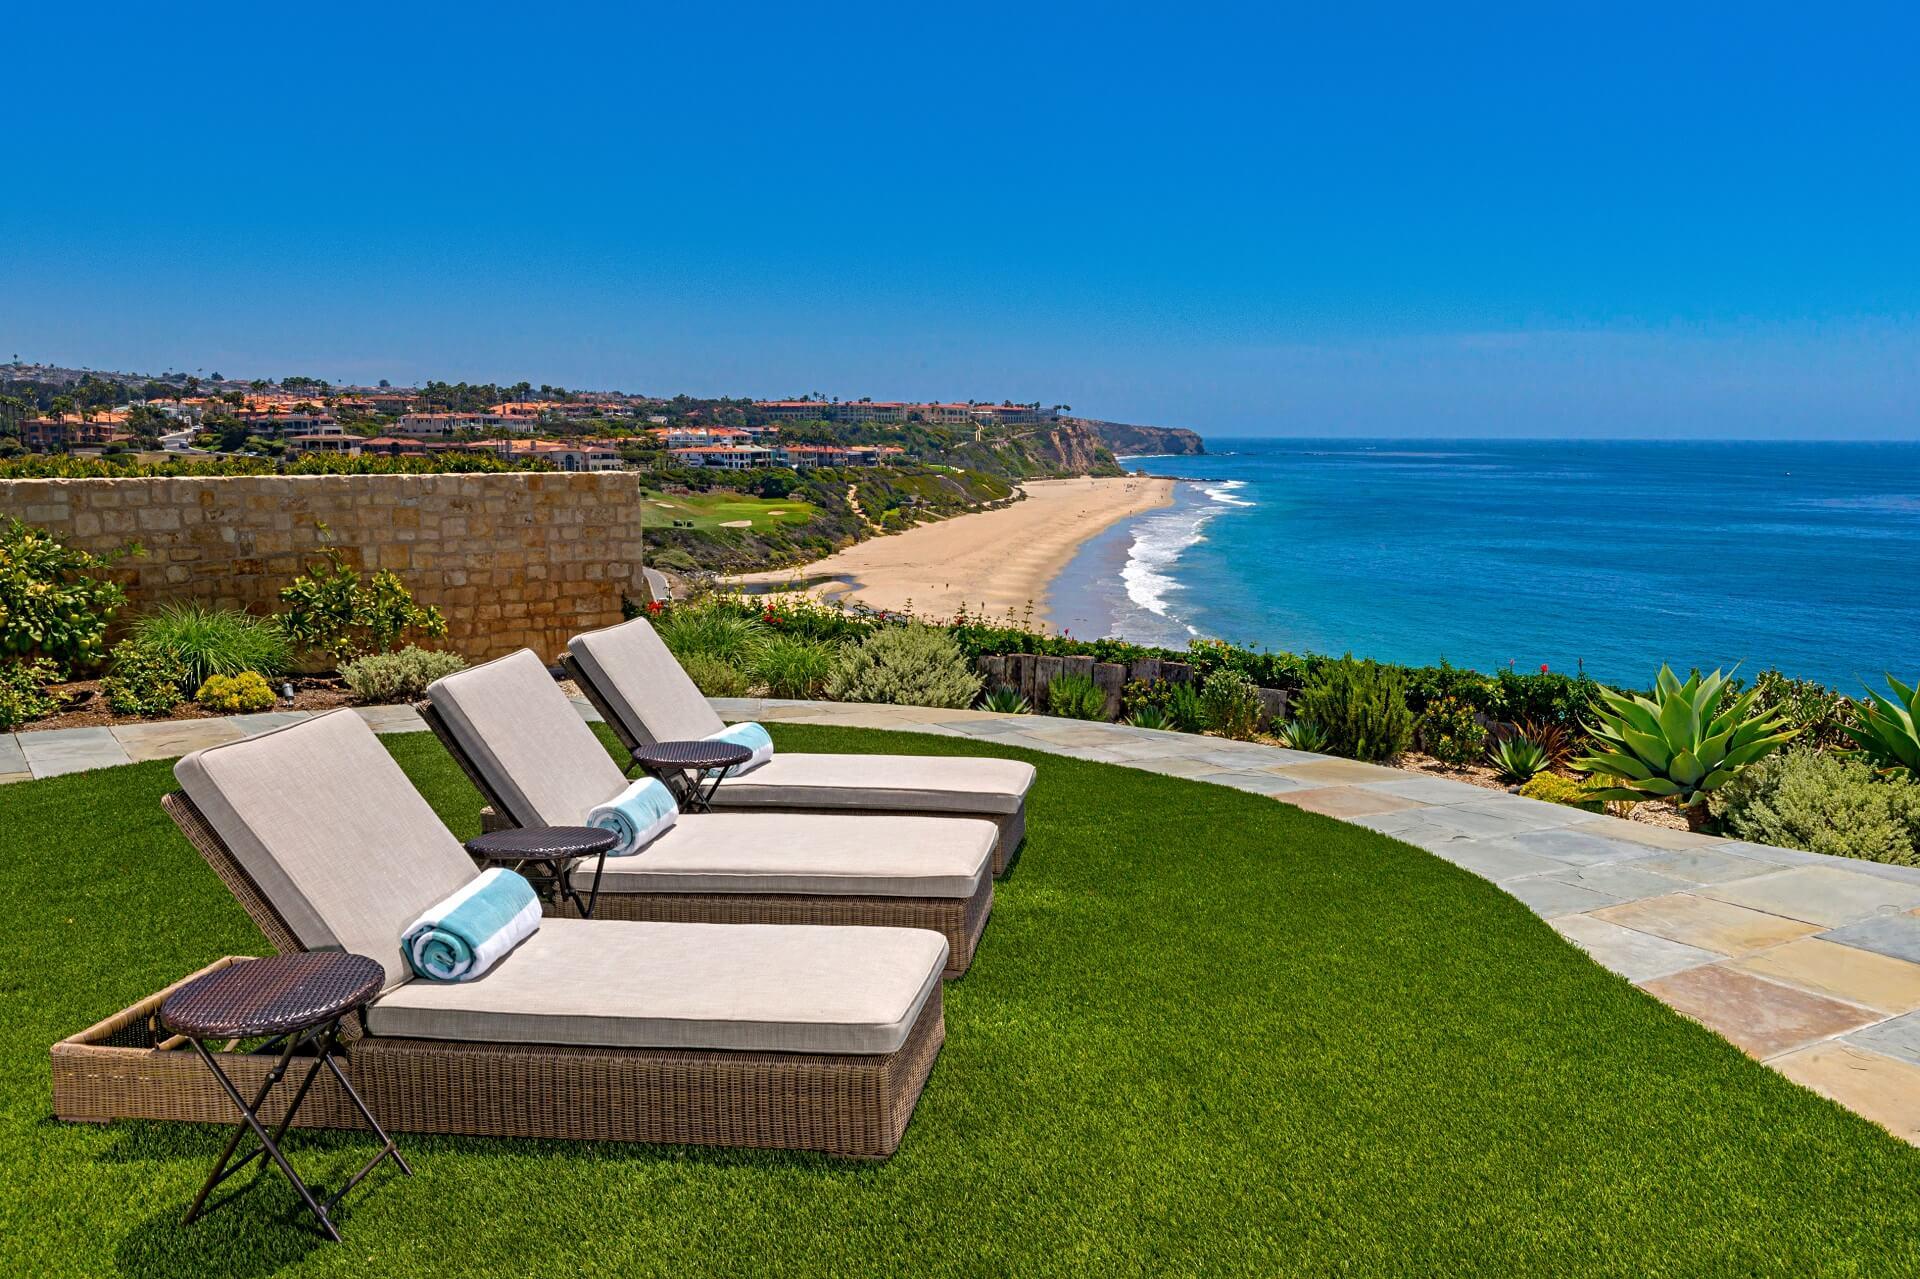 Monarch Bay California